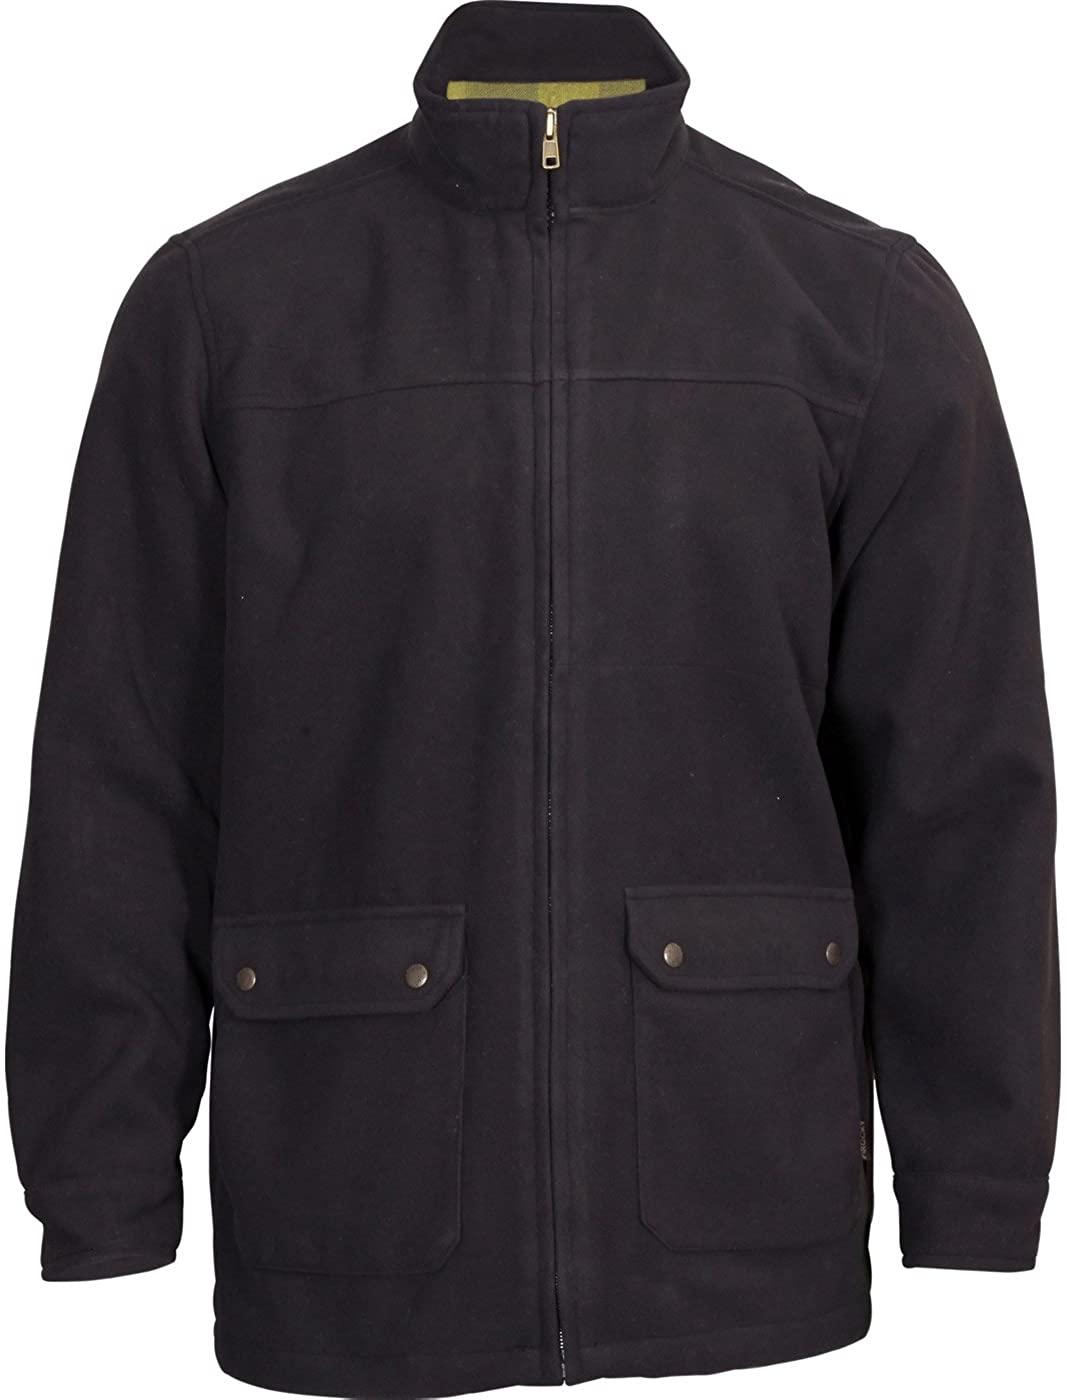 Rocky Men's Full Zip 220G Insulated Fleece Barn Jacket